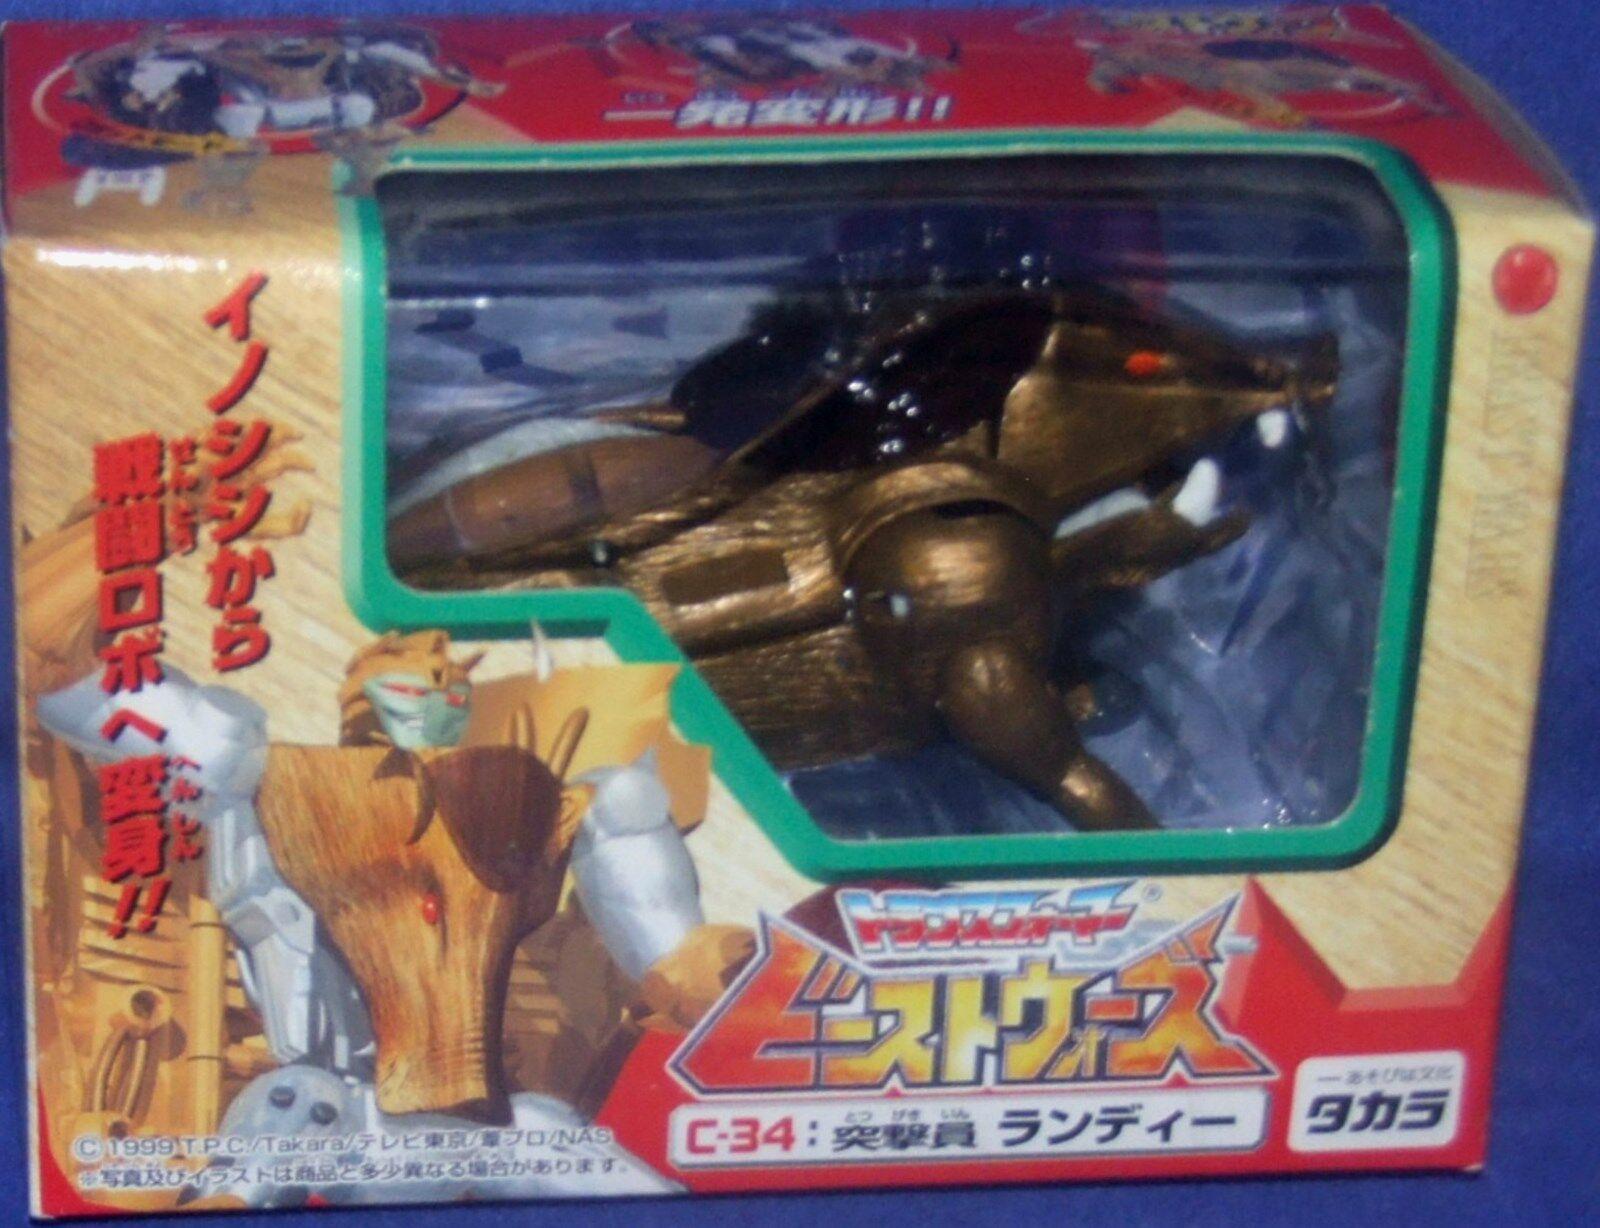 Transformers Beast Wars C-34 Razorbeast Nuovo Japanese Takara 1999